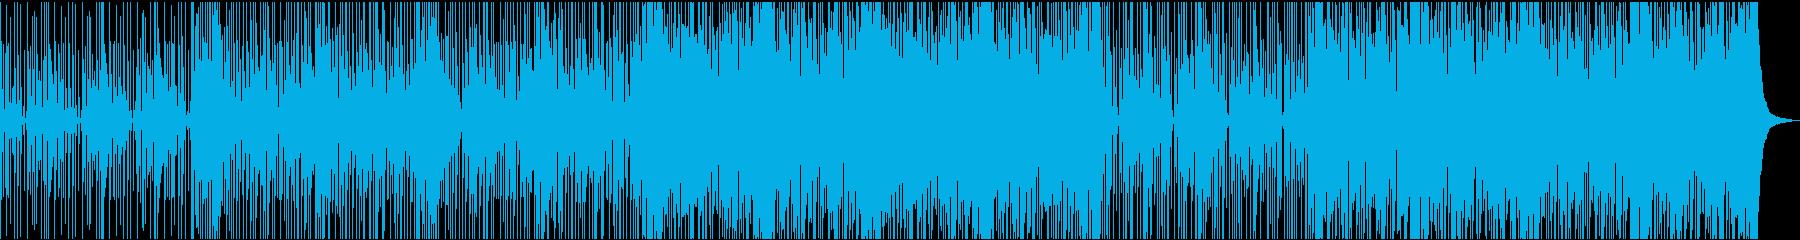 Groovy Funkyの再生済みの波形